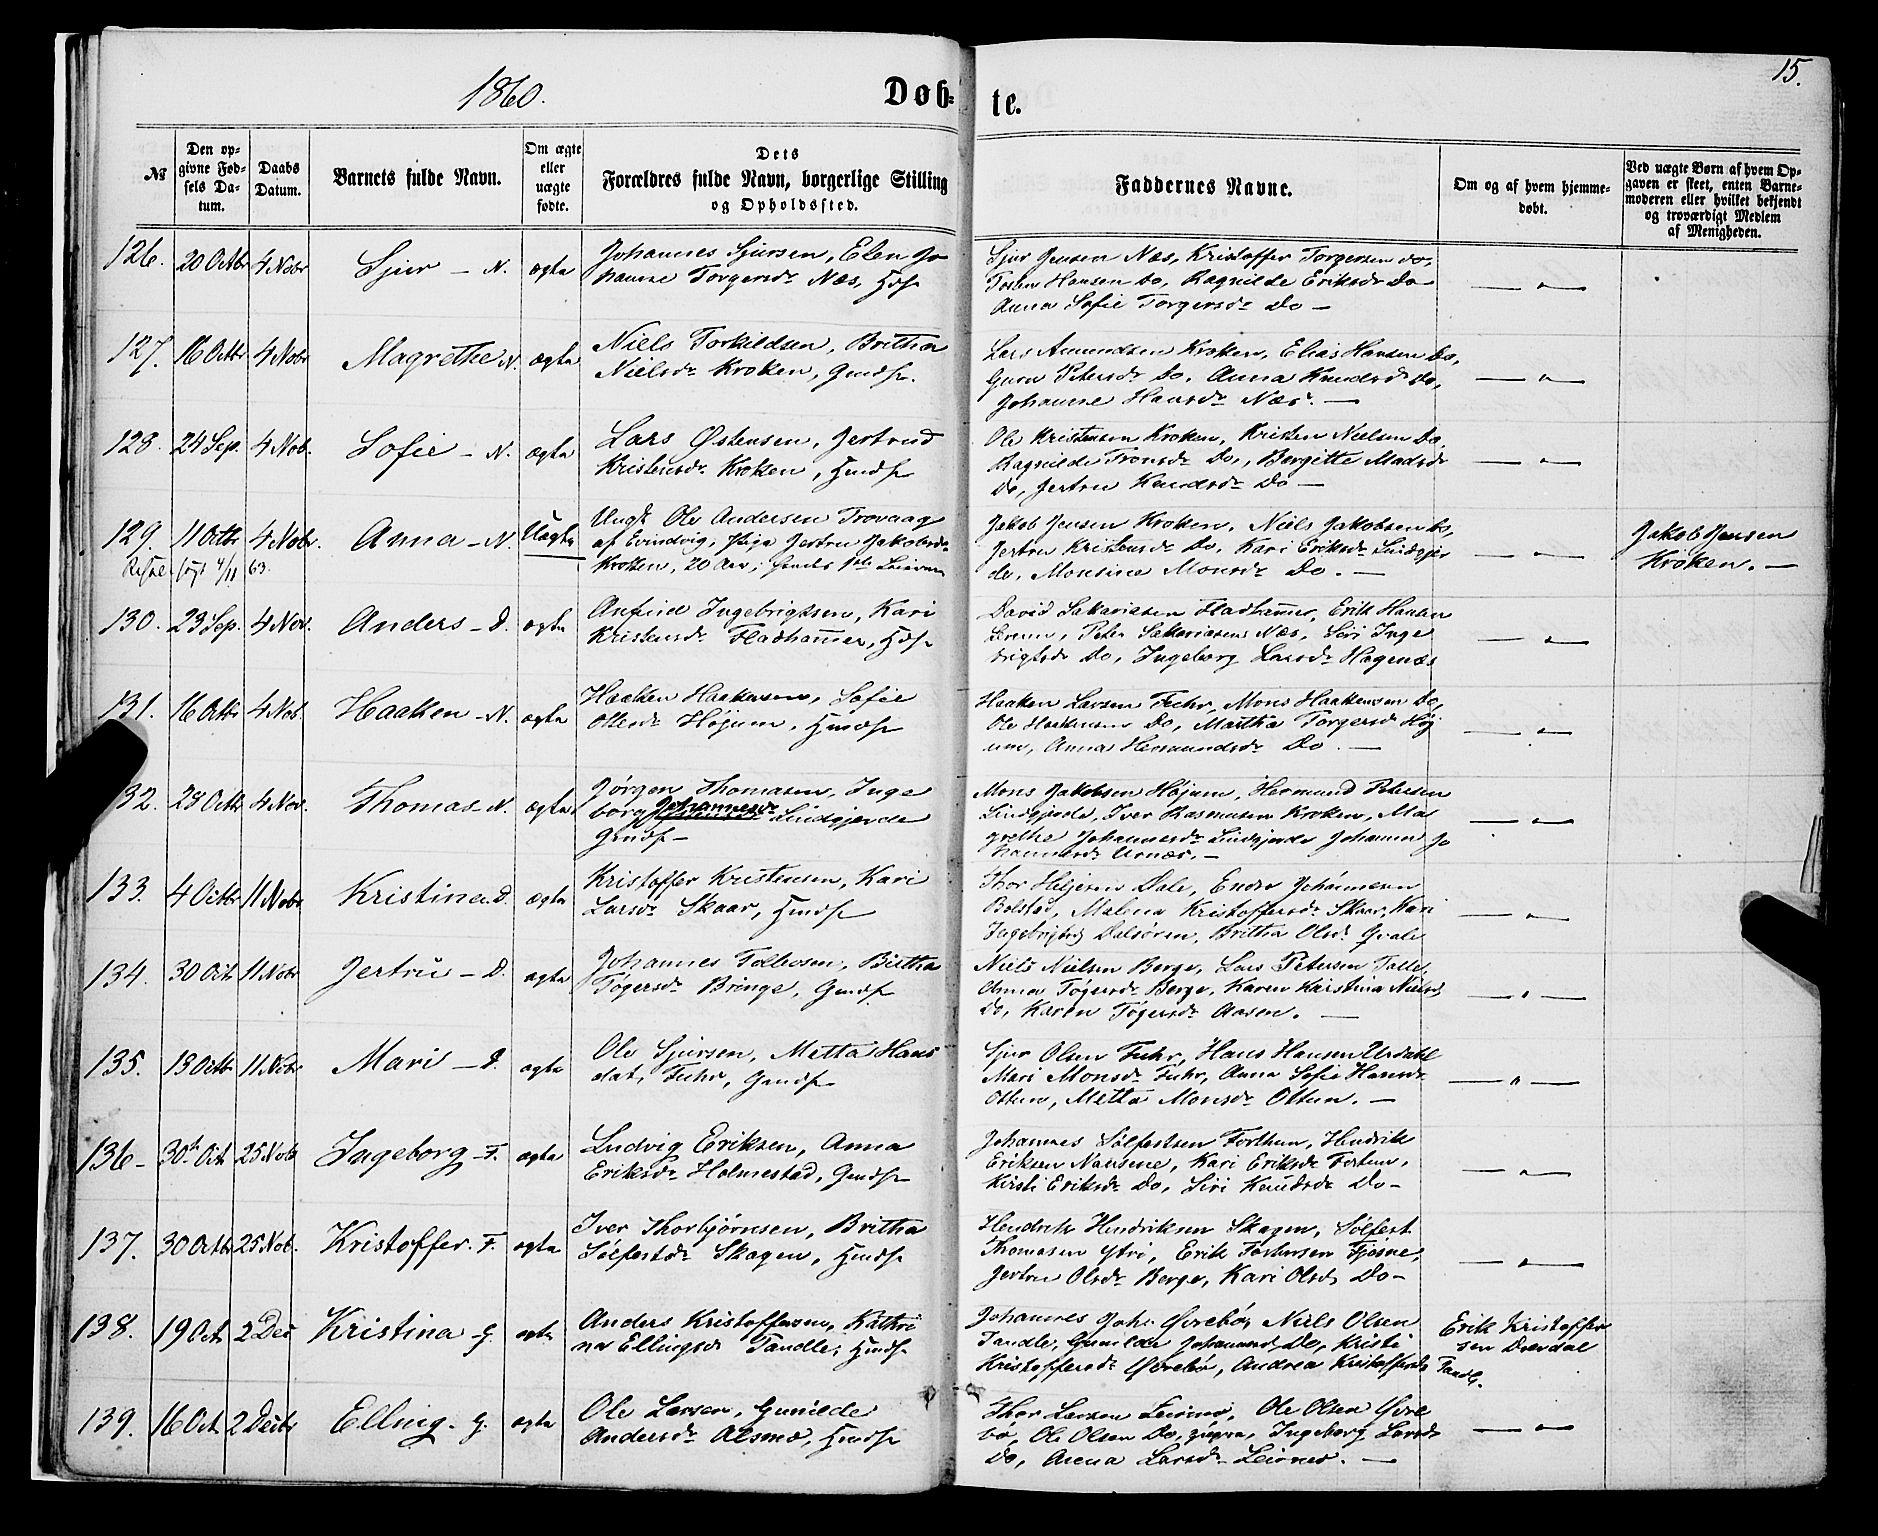 SAB, Luster sokneprestembete, H/Haa/Haaa/L0008: Parish register (official) no. A 8, 1860-1870, p. 15